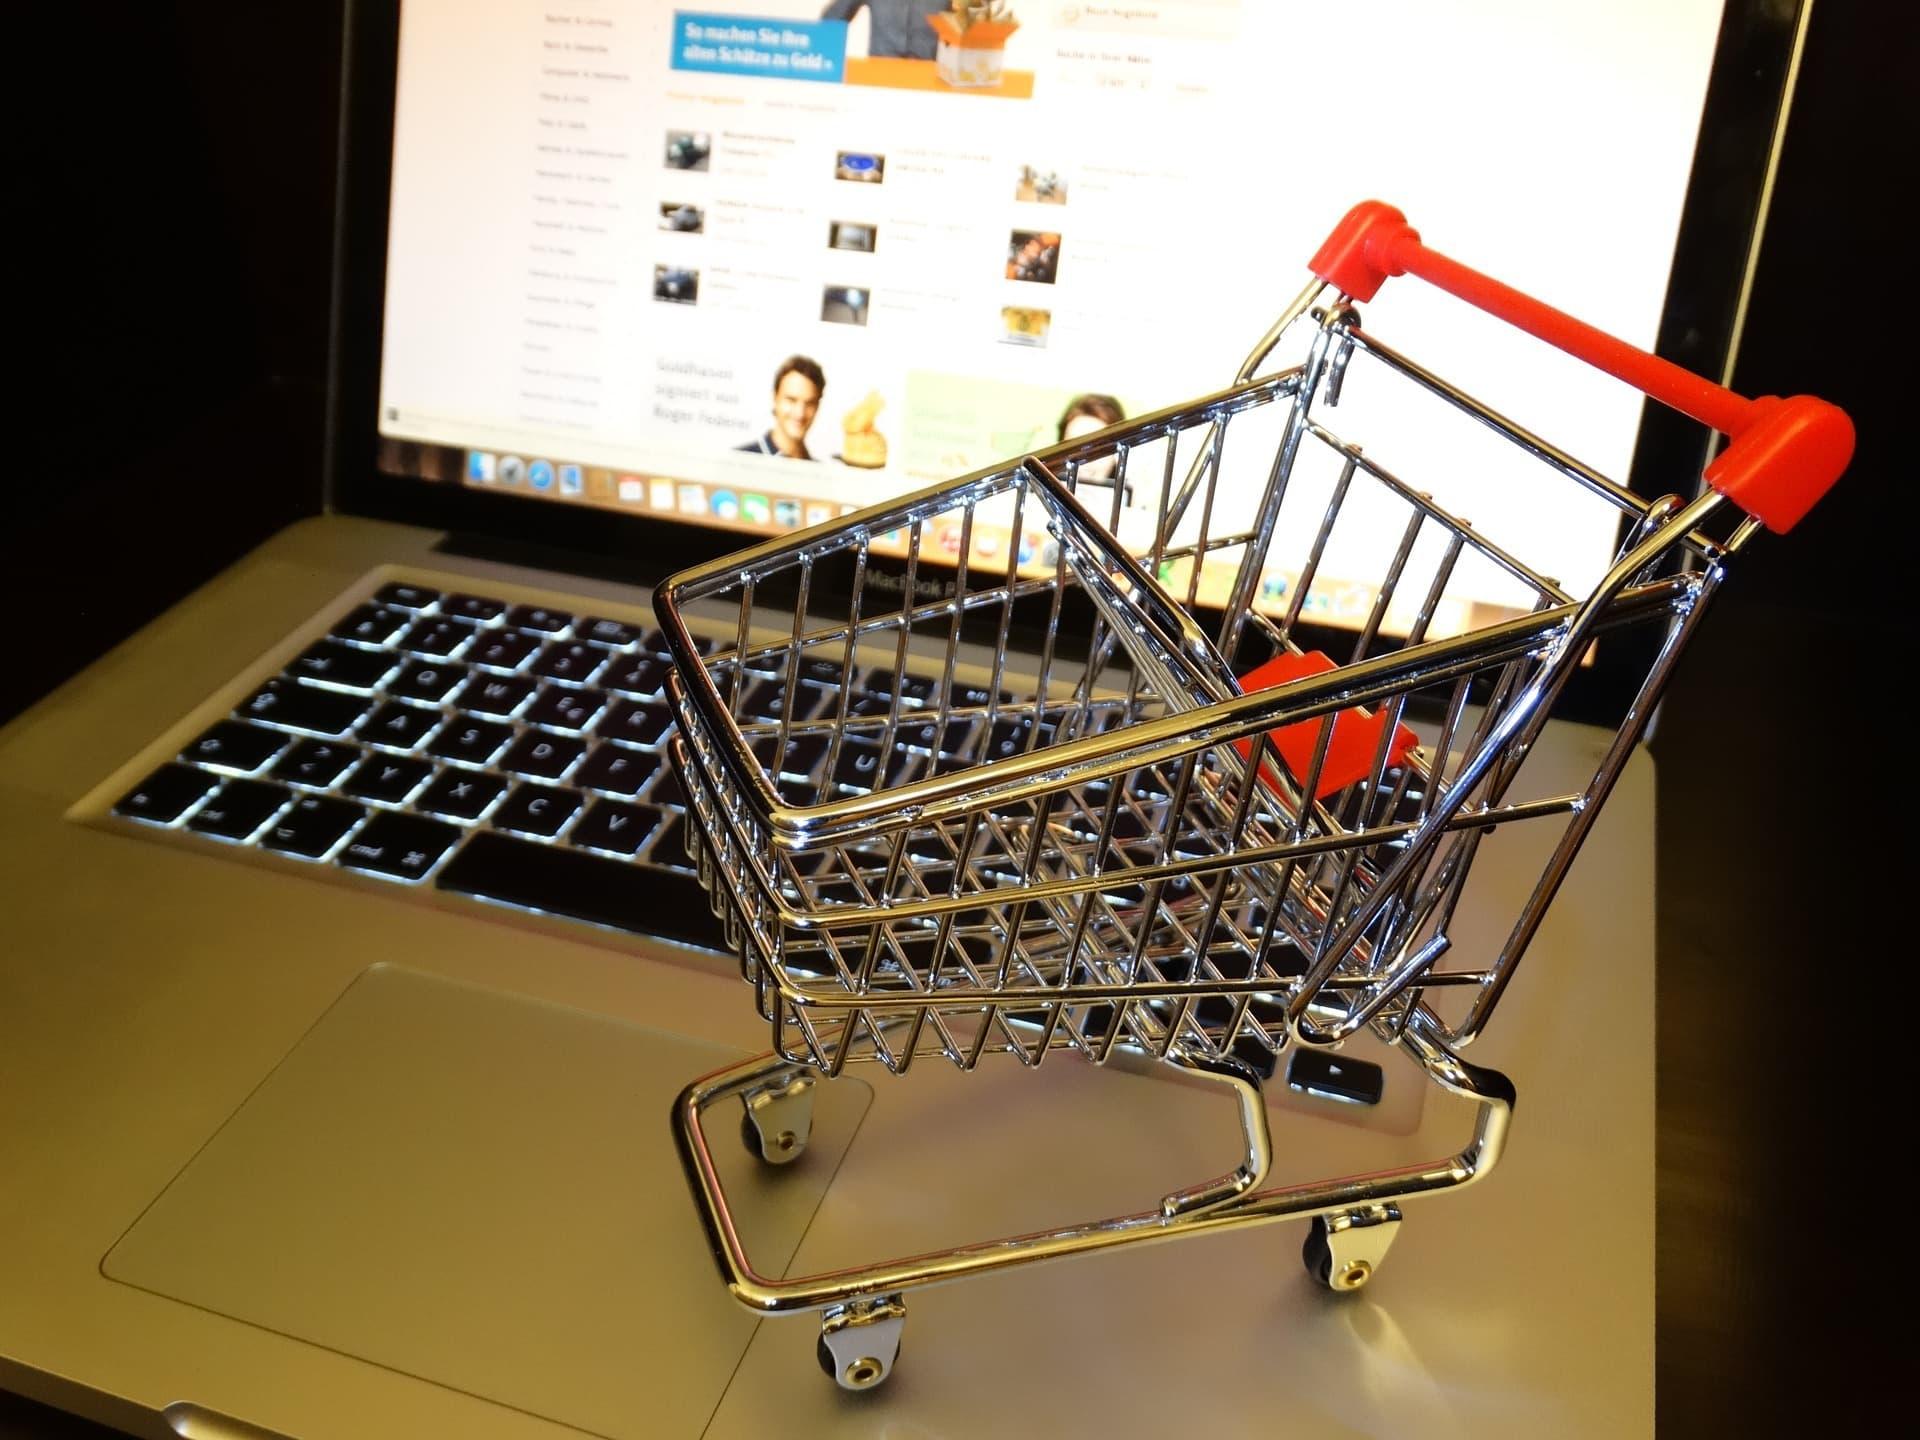 Transkriptionsservice: Thema Online Shops